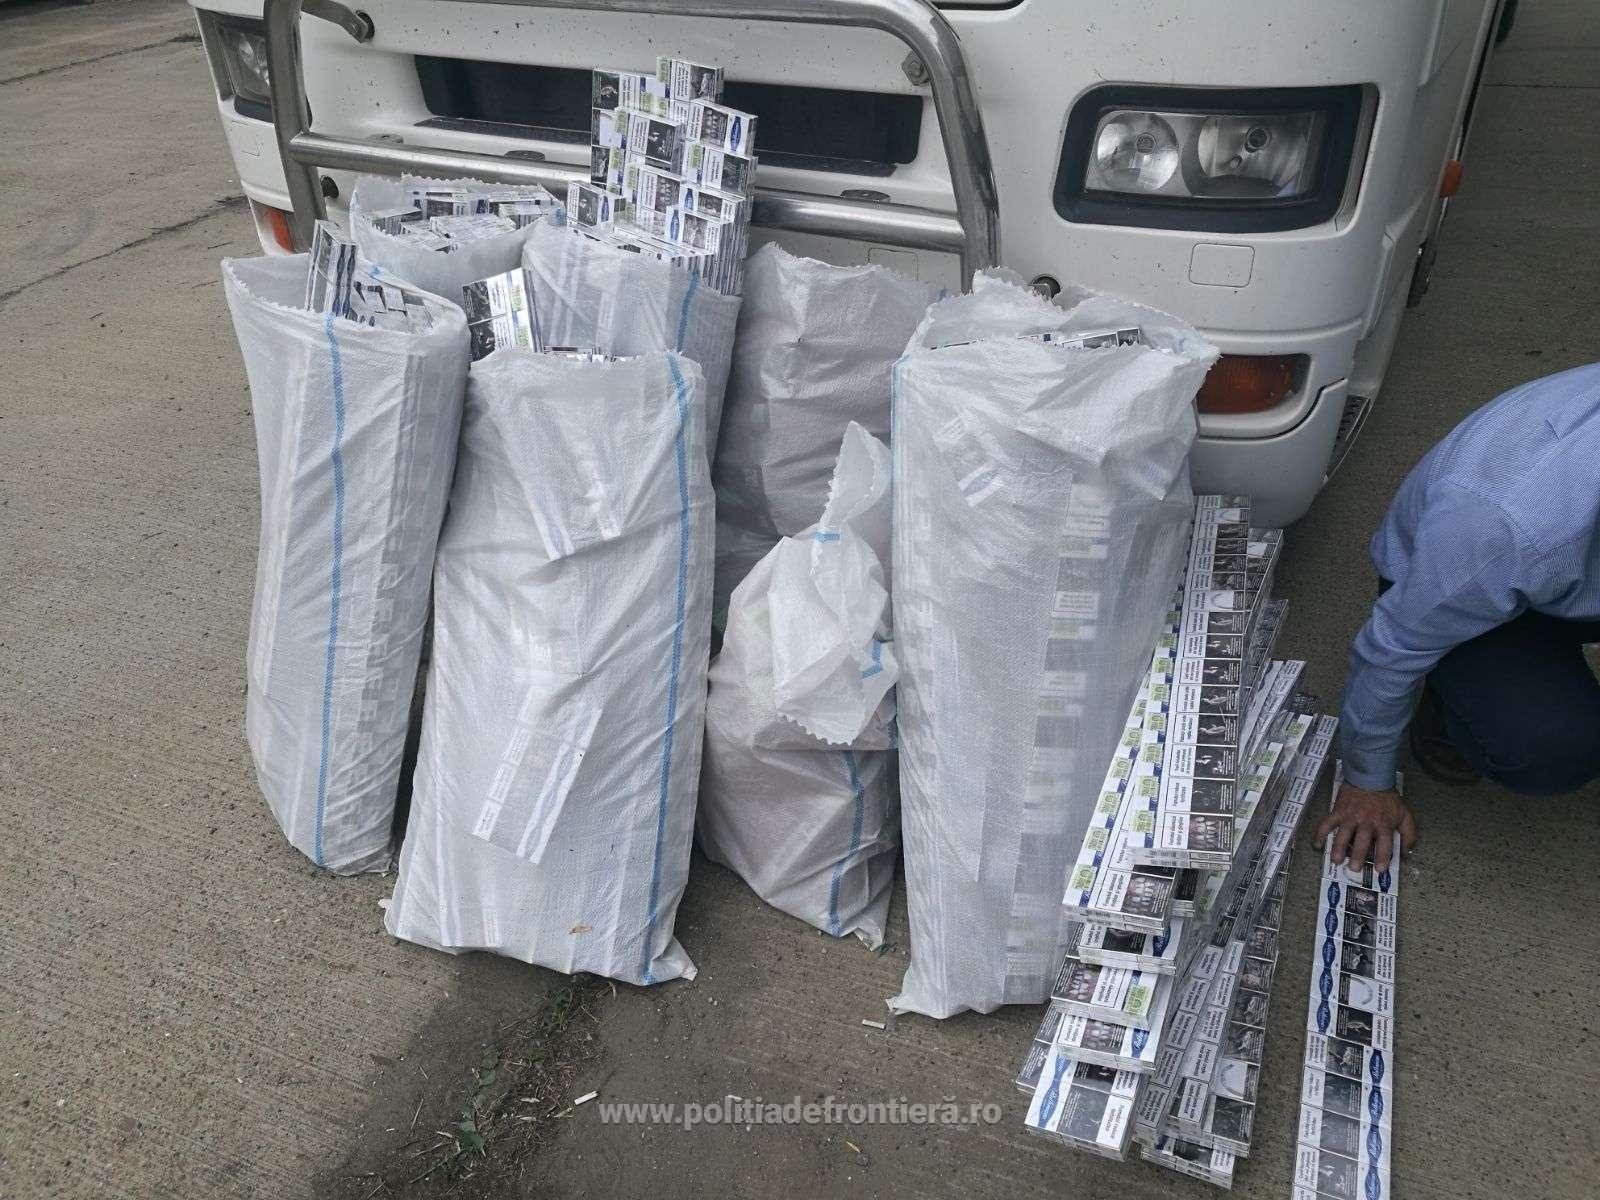 Politia de frontiera a confiscat tigari de contrabanda ascunse in rezervor accidentelive.jpeg